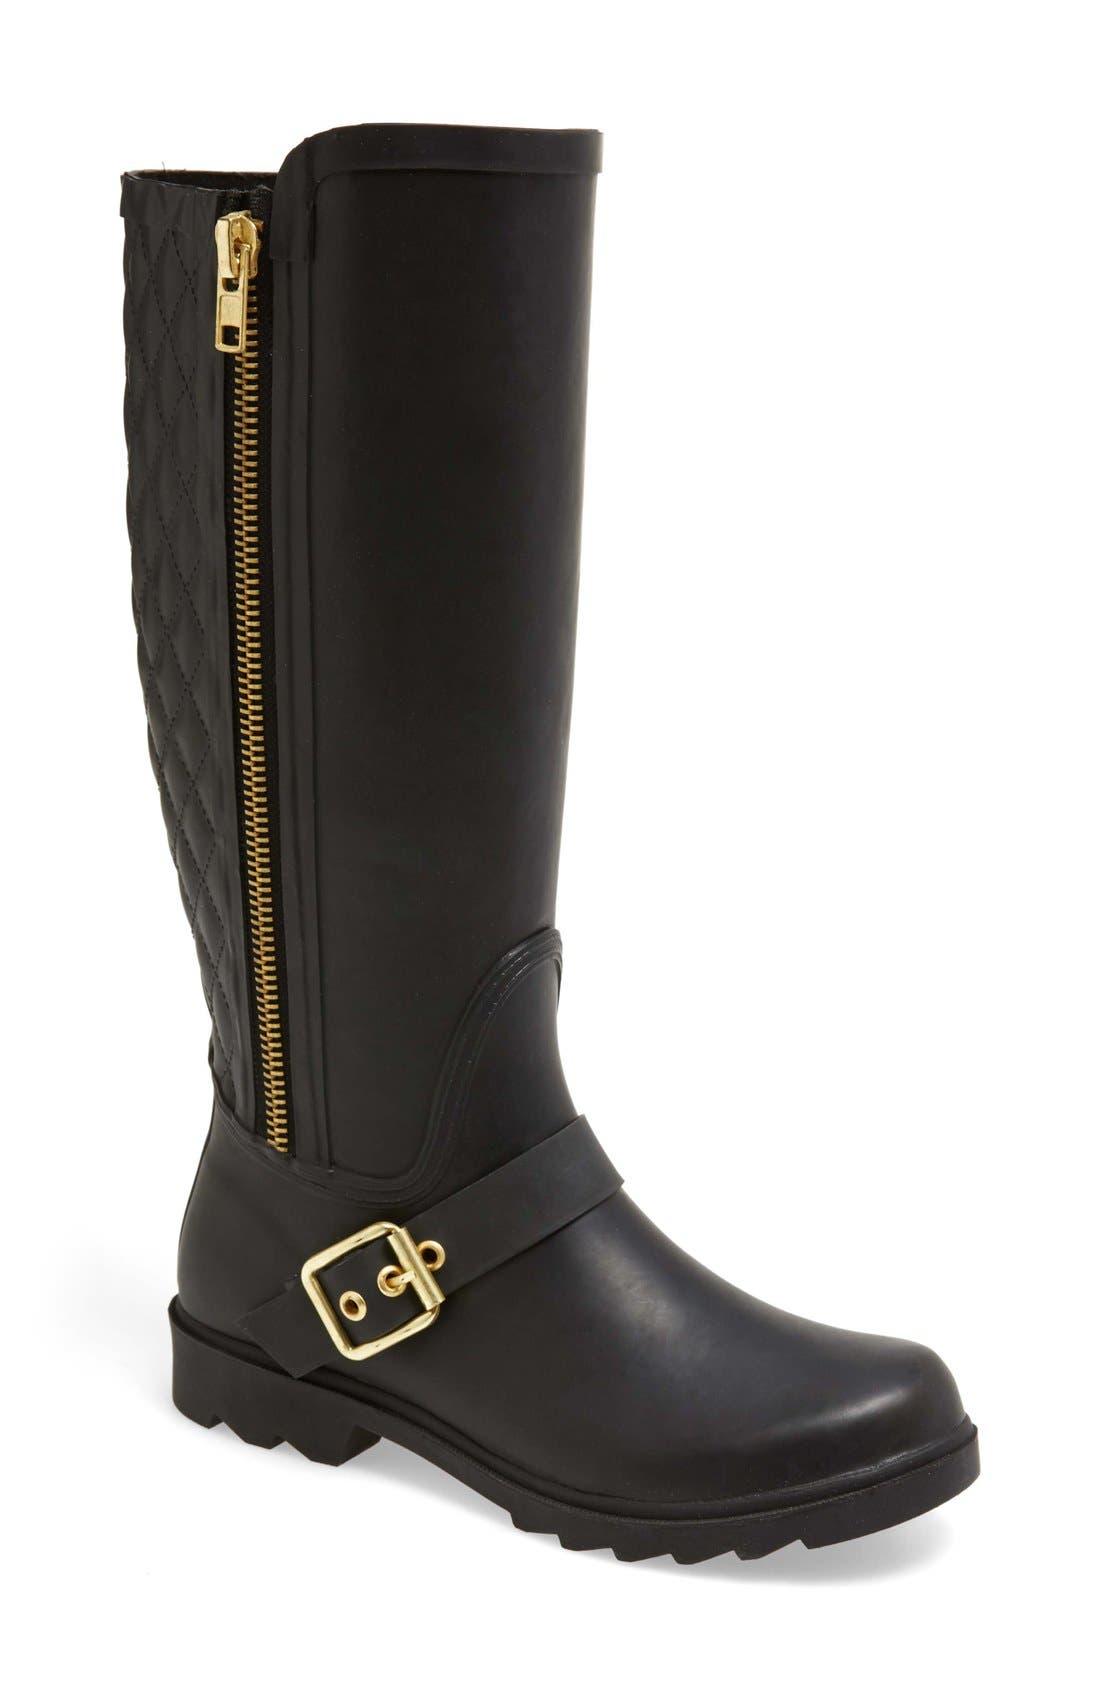 Main Image - Steven Madden 'Northpol' TallRain Boot(Women)